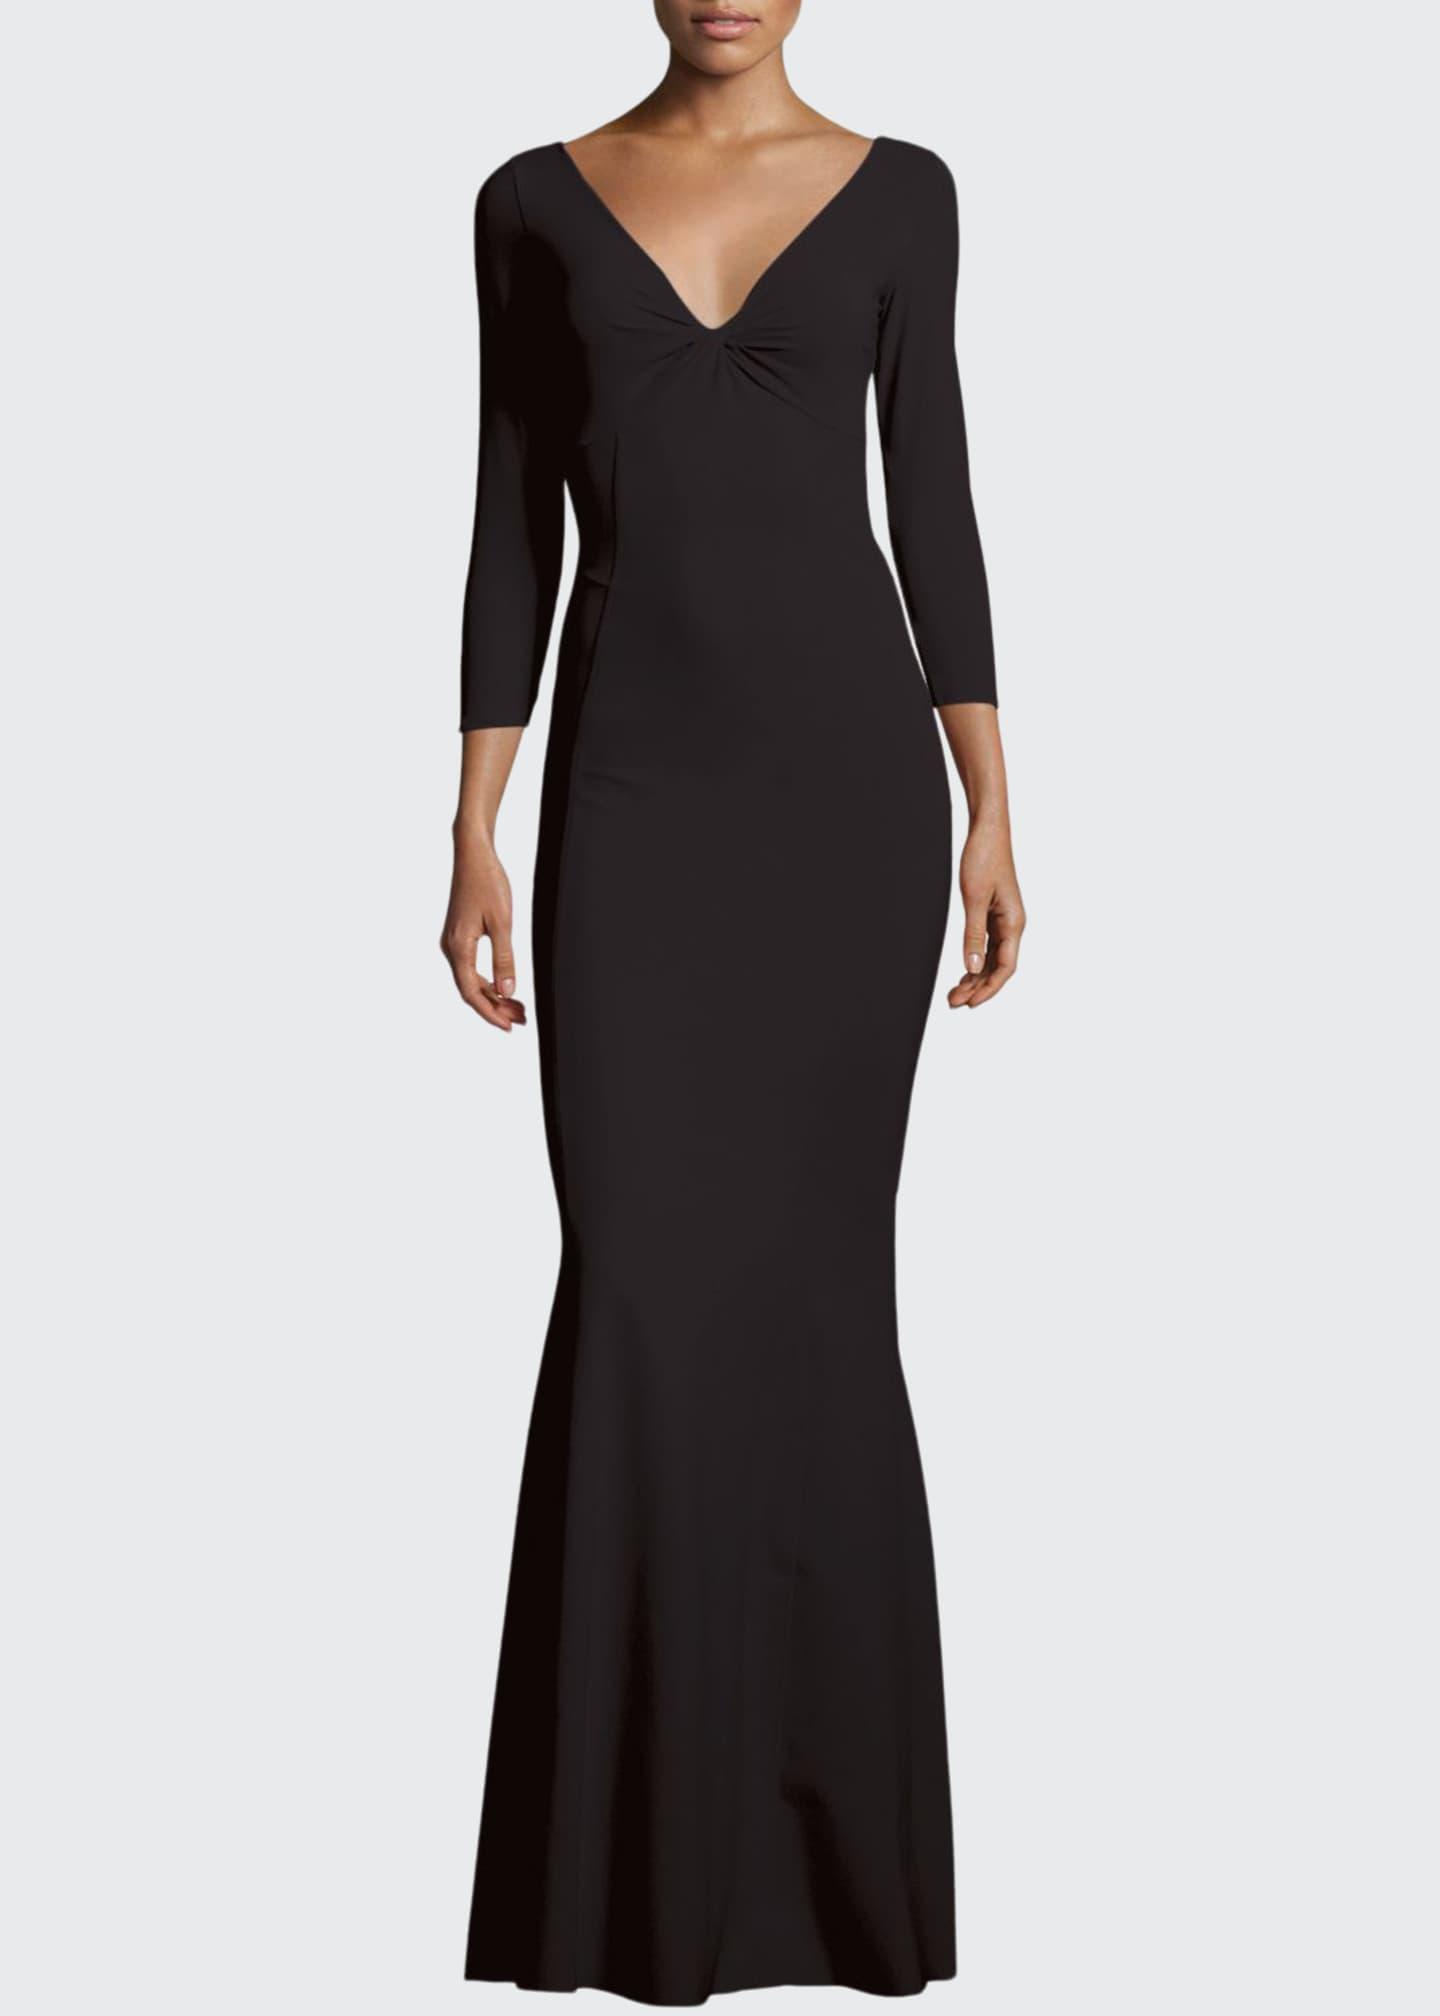 Chiara Boni La Petite Robe Custom Collection: Saturnnia